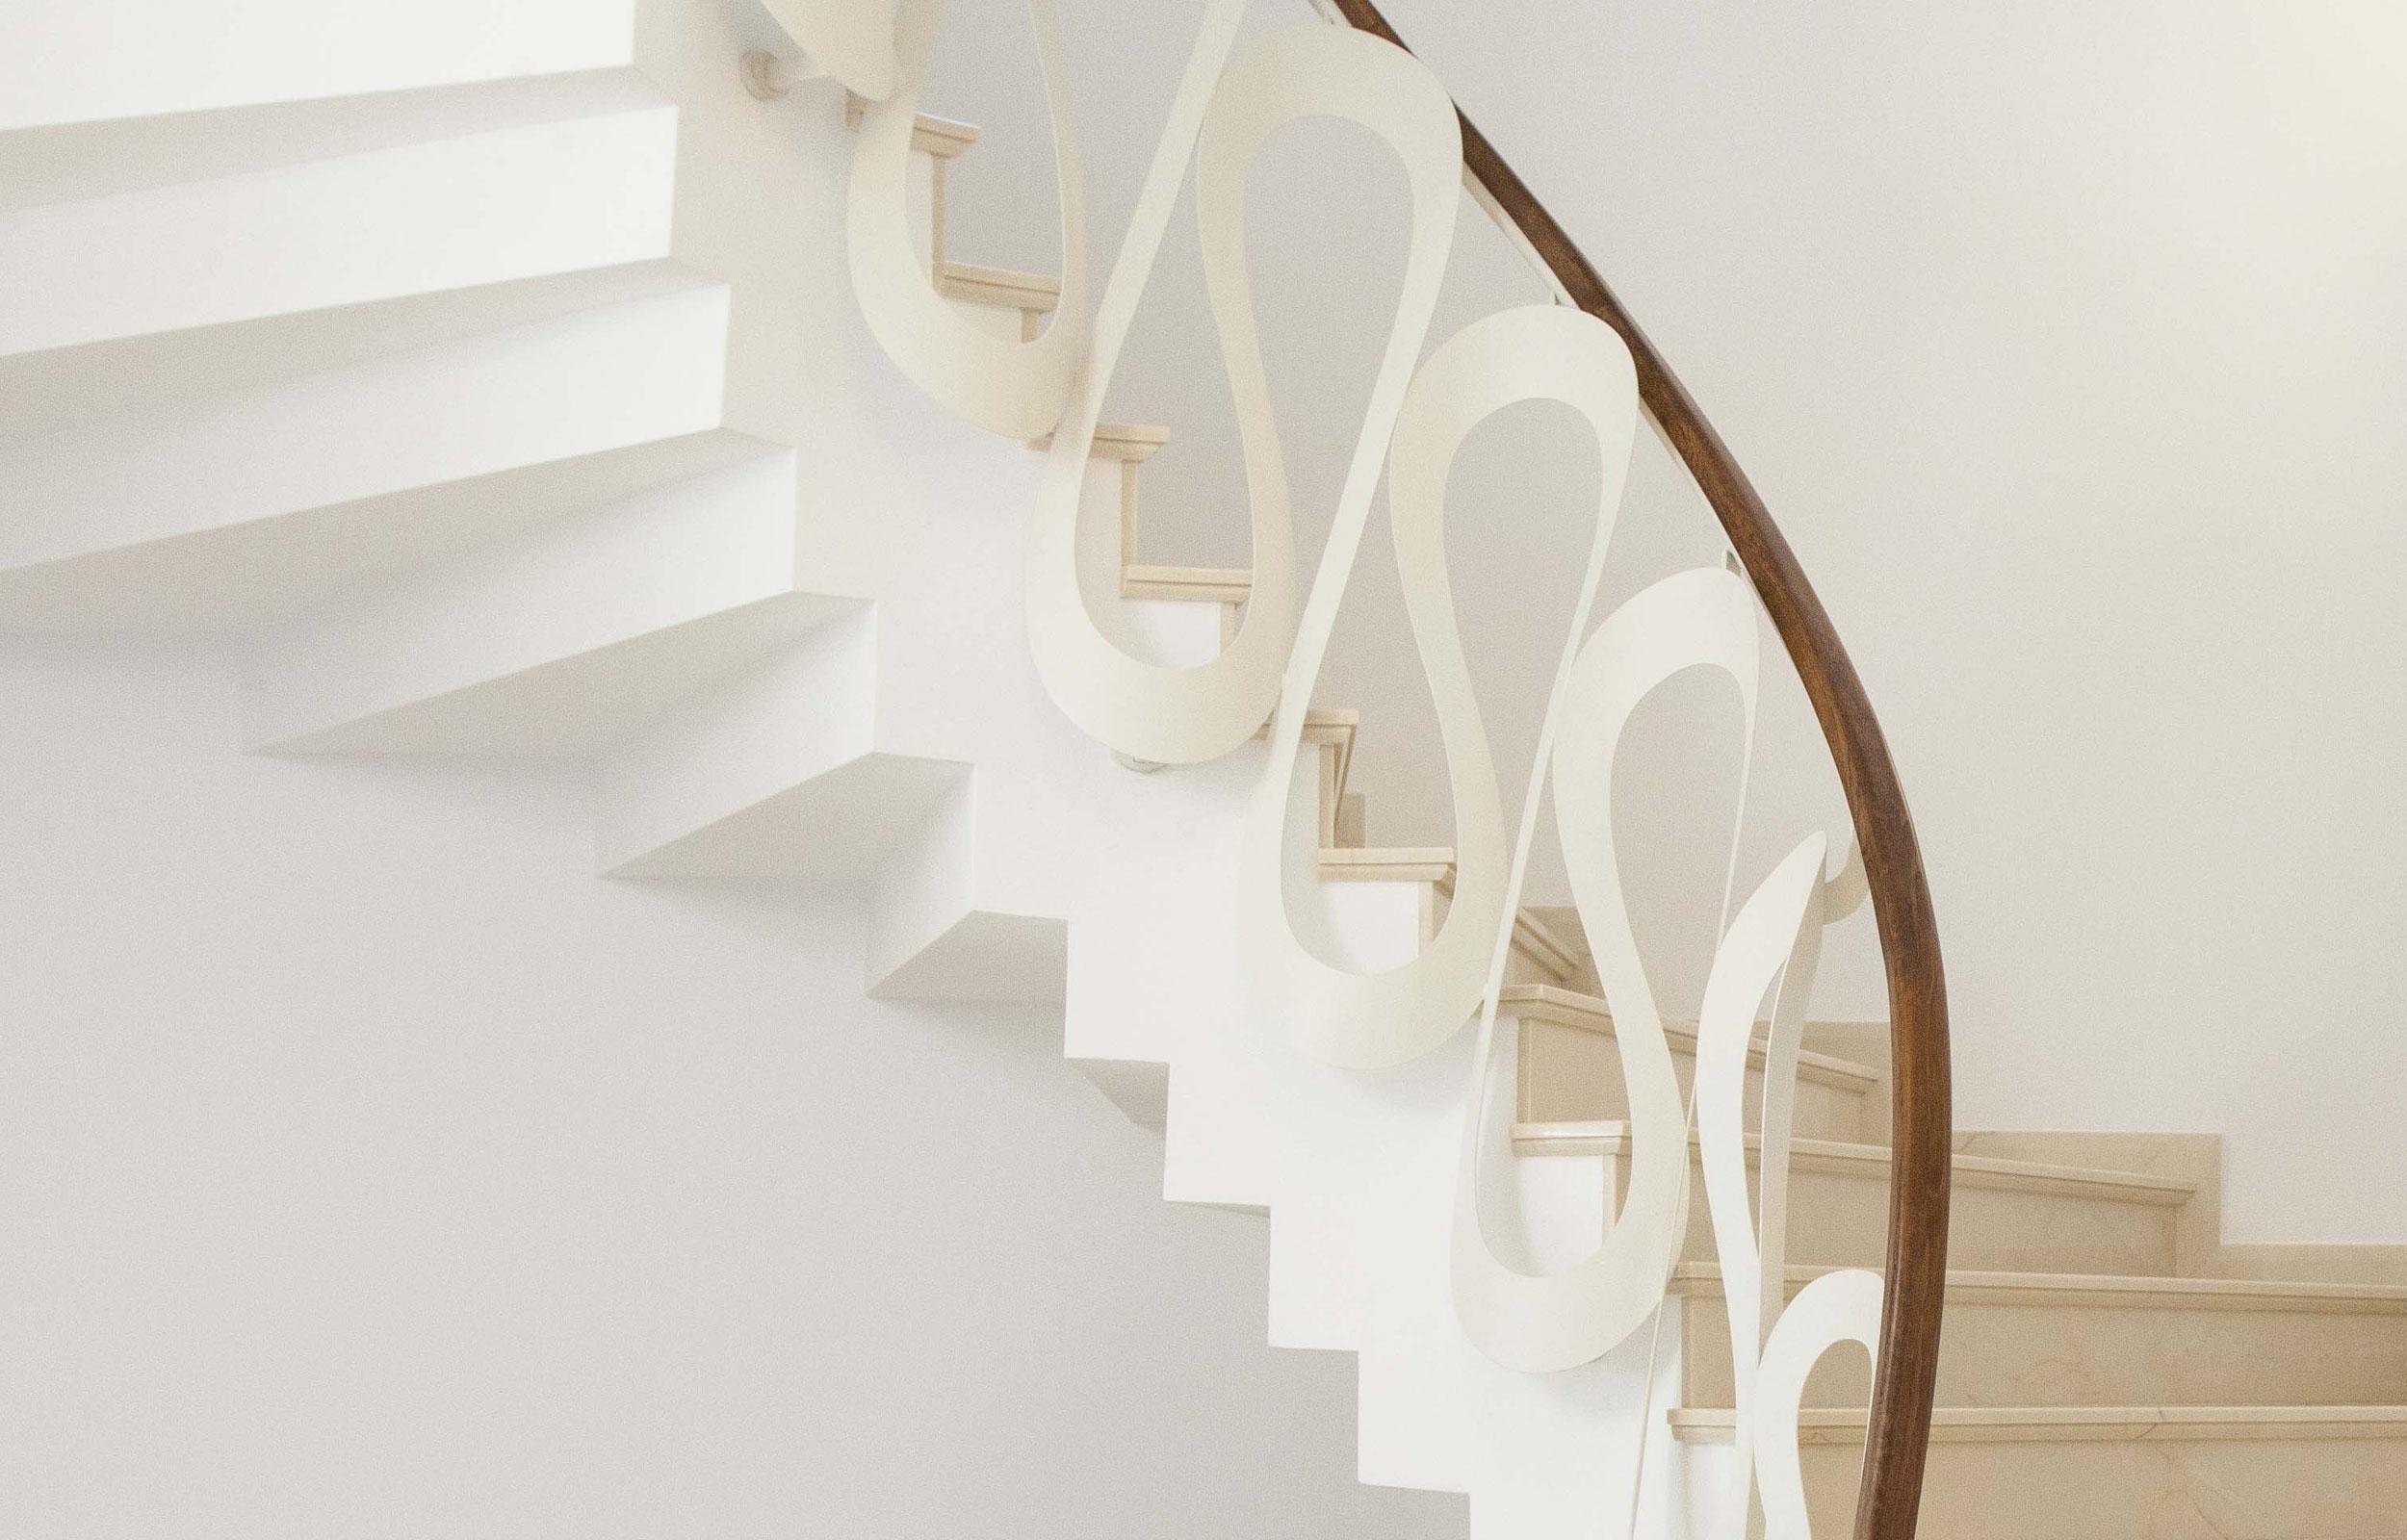 Scara interioara balustrada metal lemn haute couture